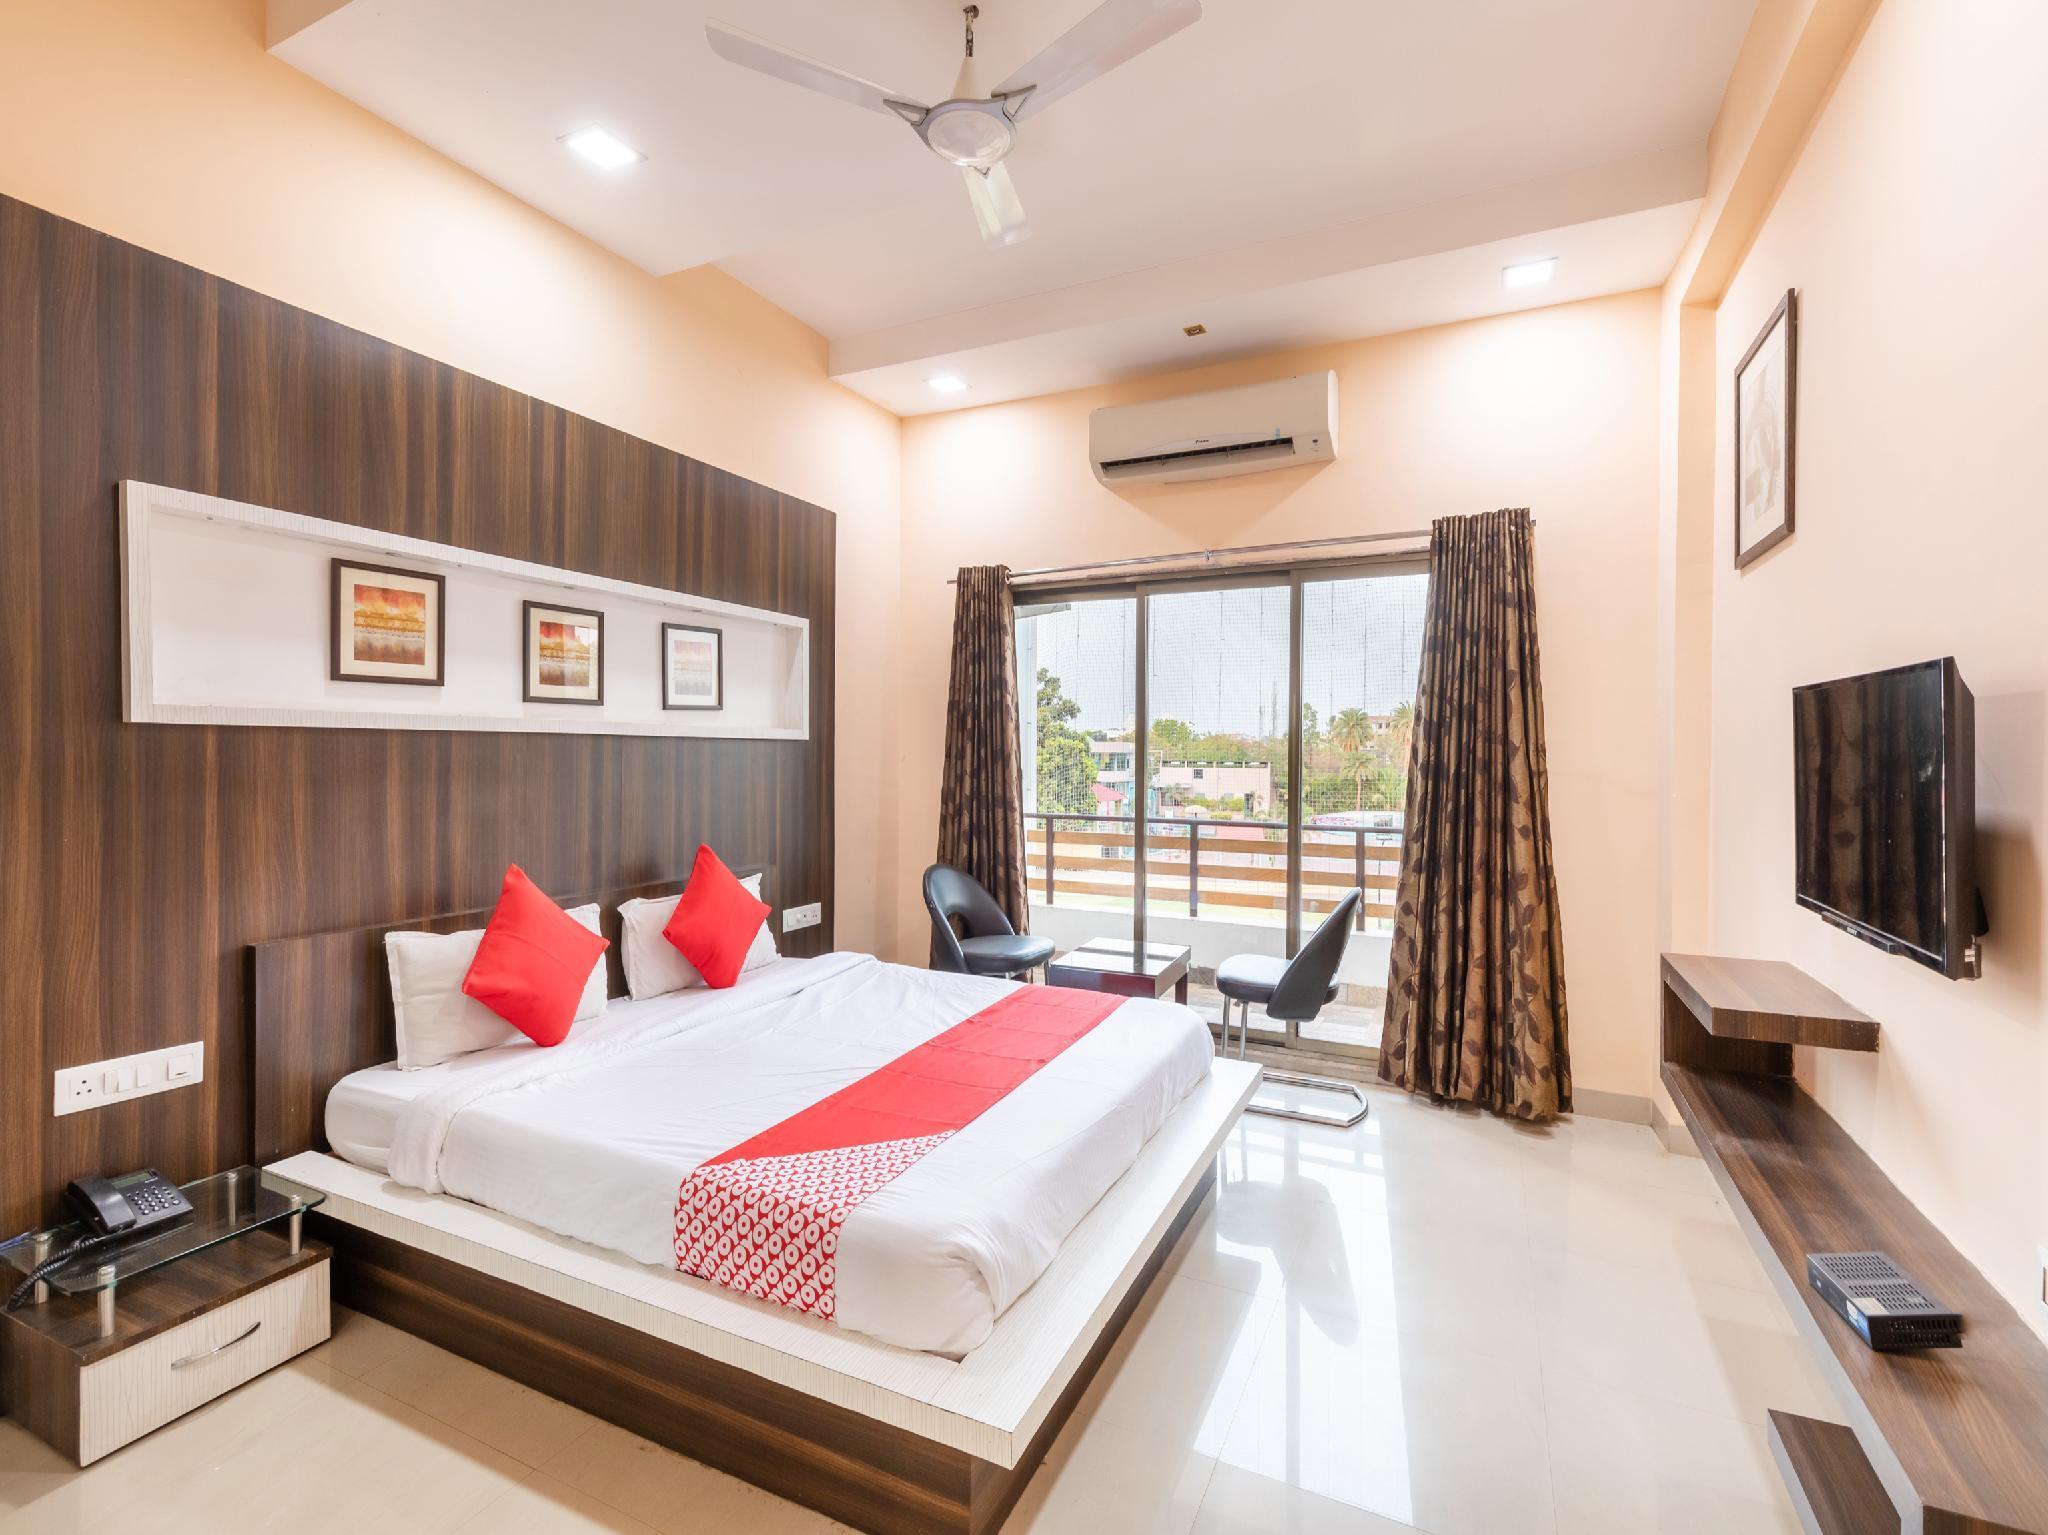 OYO 42910 Hotel Rudra Palace